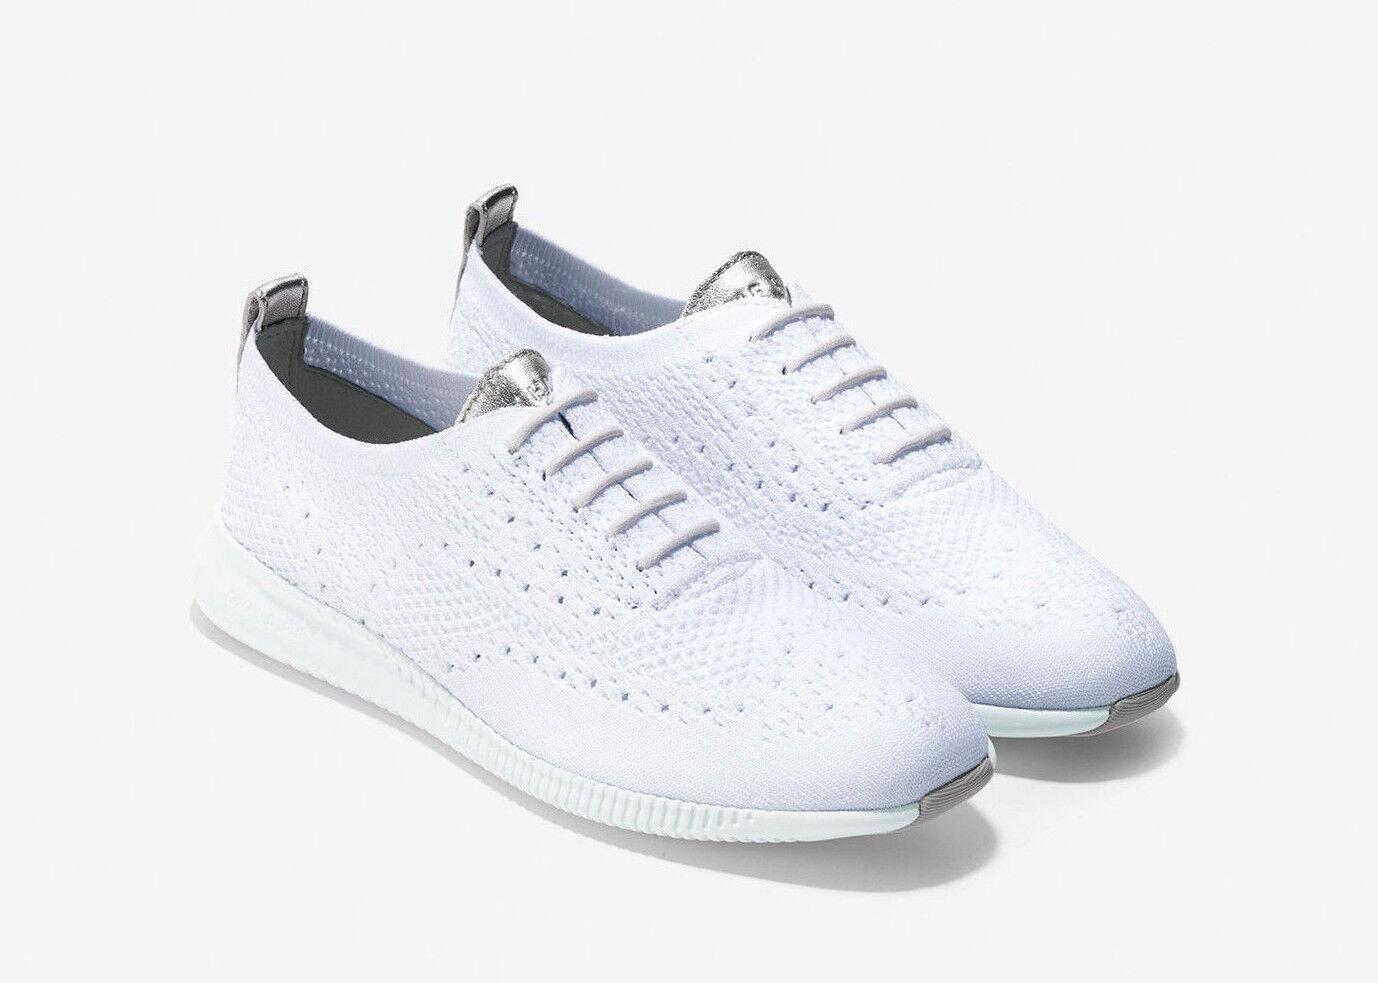 NIB Cole Haan Women's 2.0 Zerogrand Stitchlite Oxford Shoes W10587 Optic White